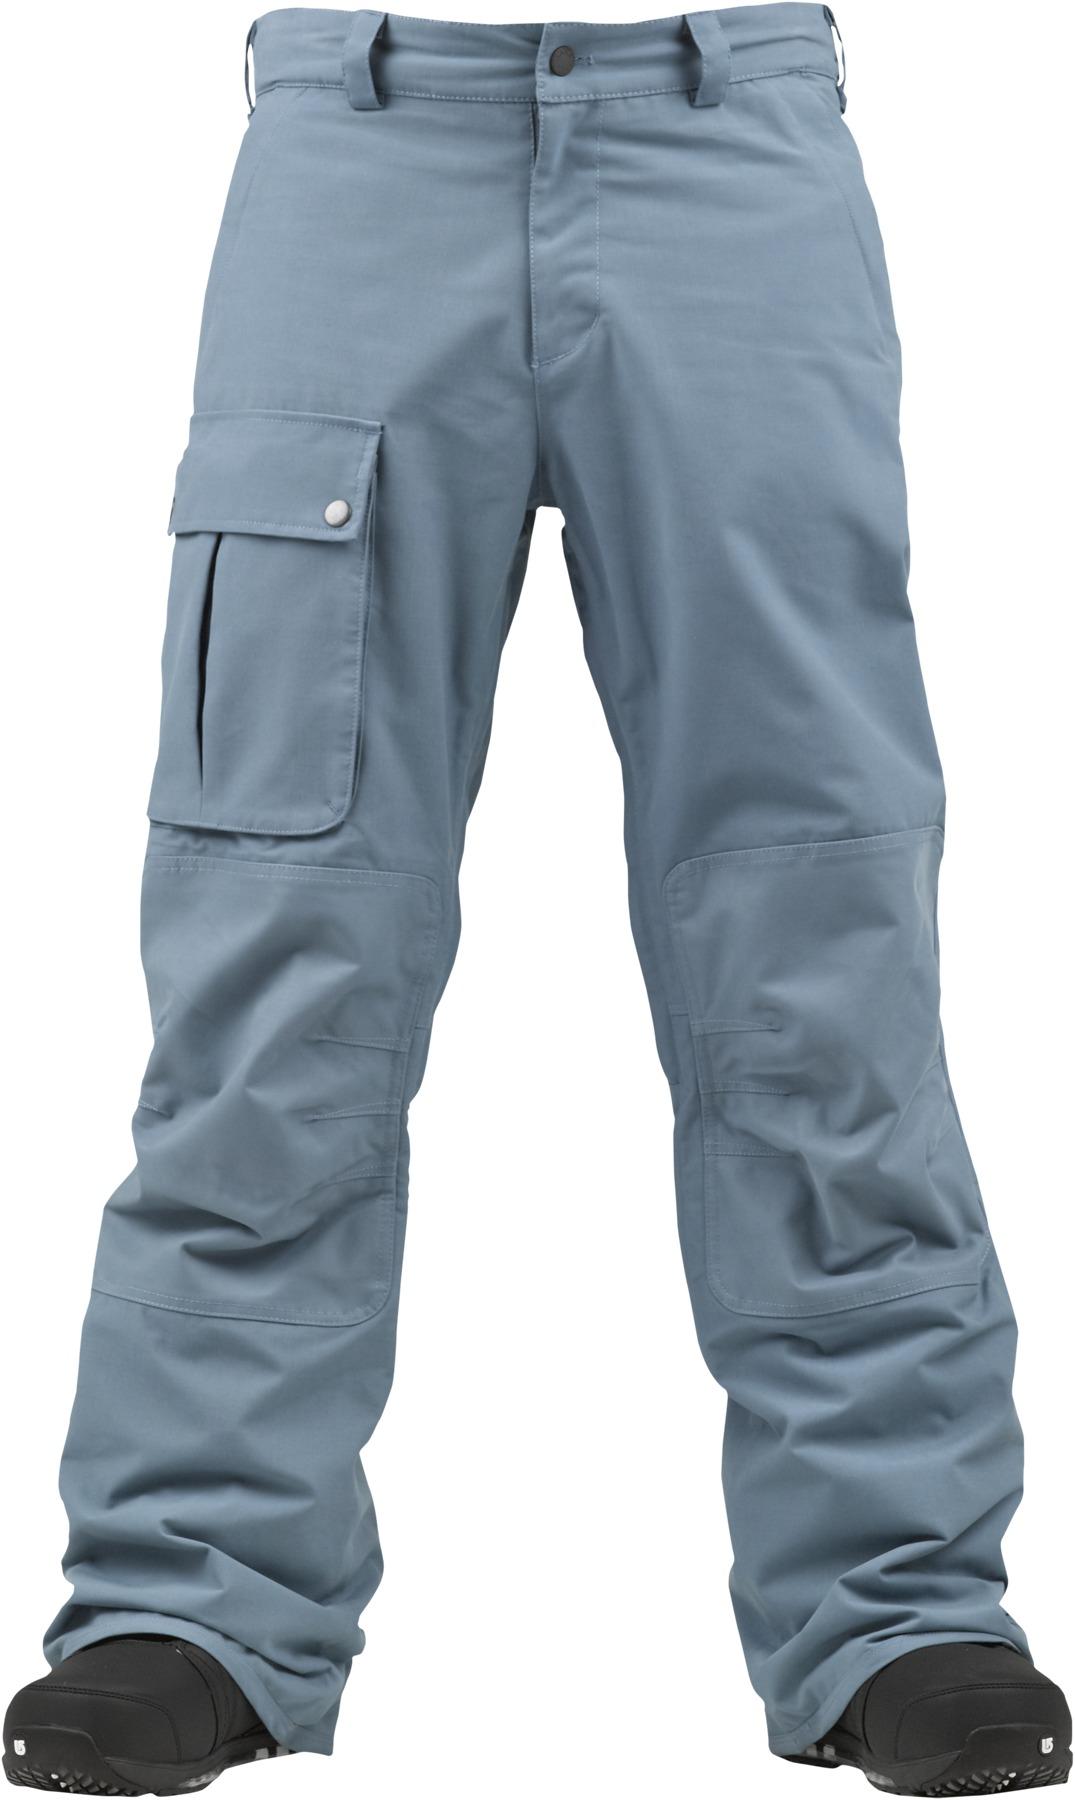 Spodnie Snowboardowe Burton Heritage Panel (Bluestone)